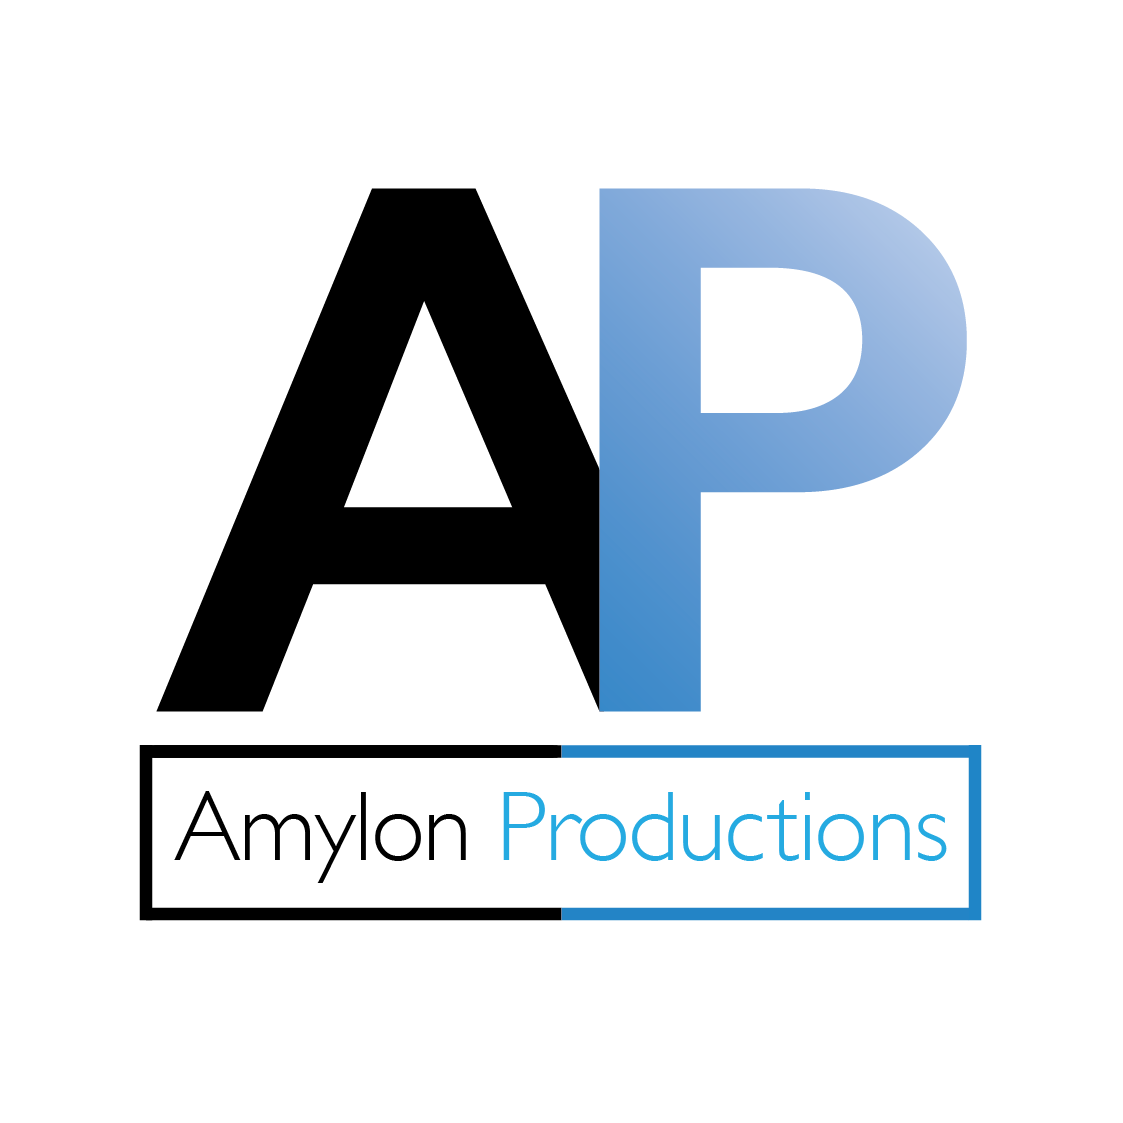 Amylon Productions